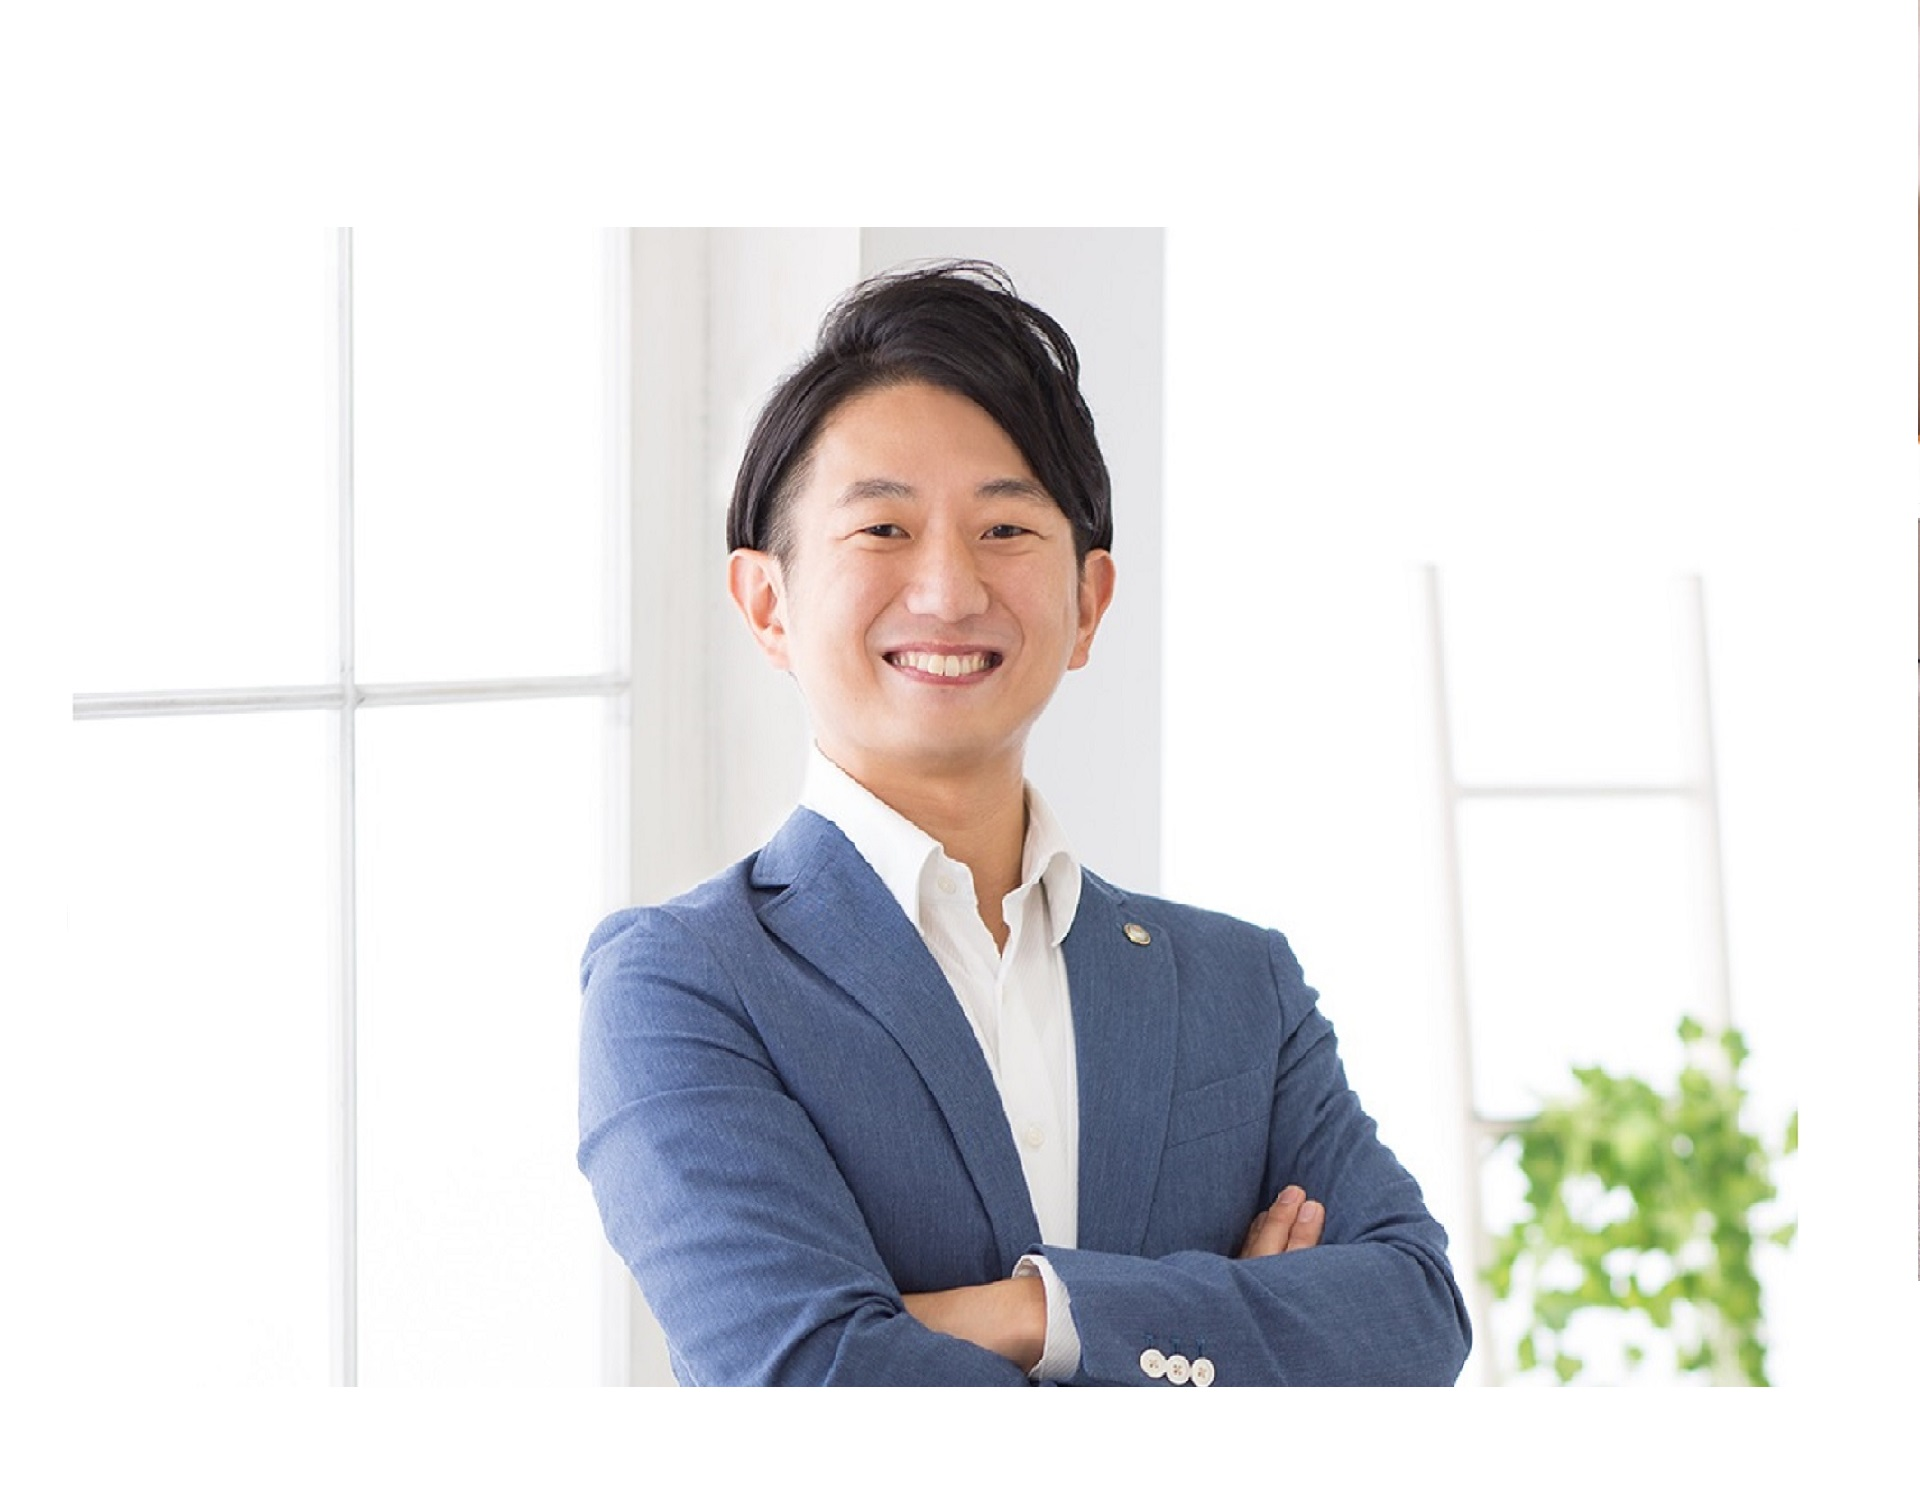 ALEX会計事務所は、「店舗型ビジネス×財務支援」に特化した事務所です!